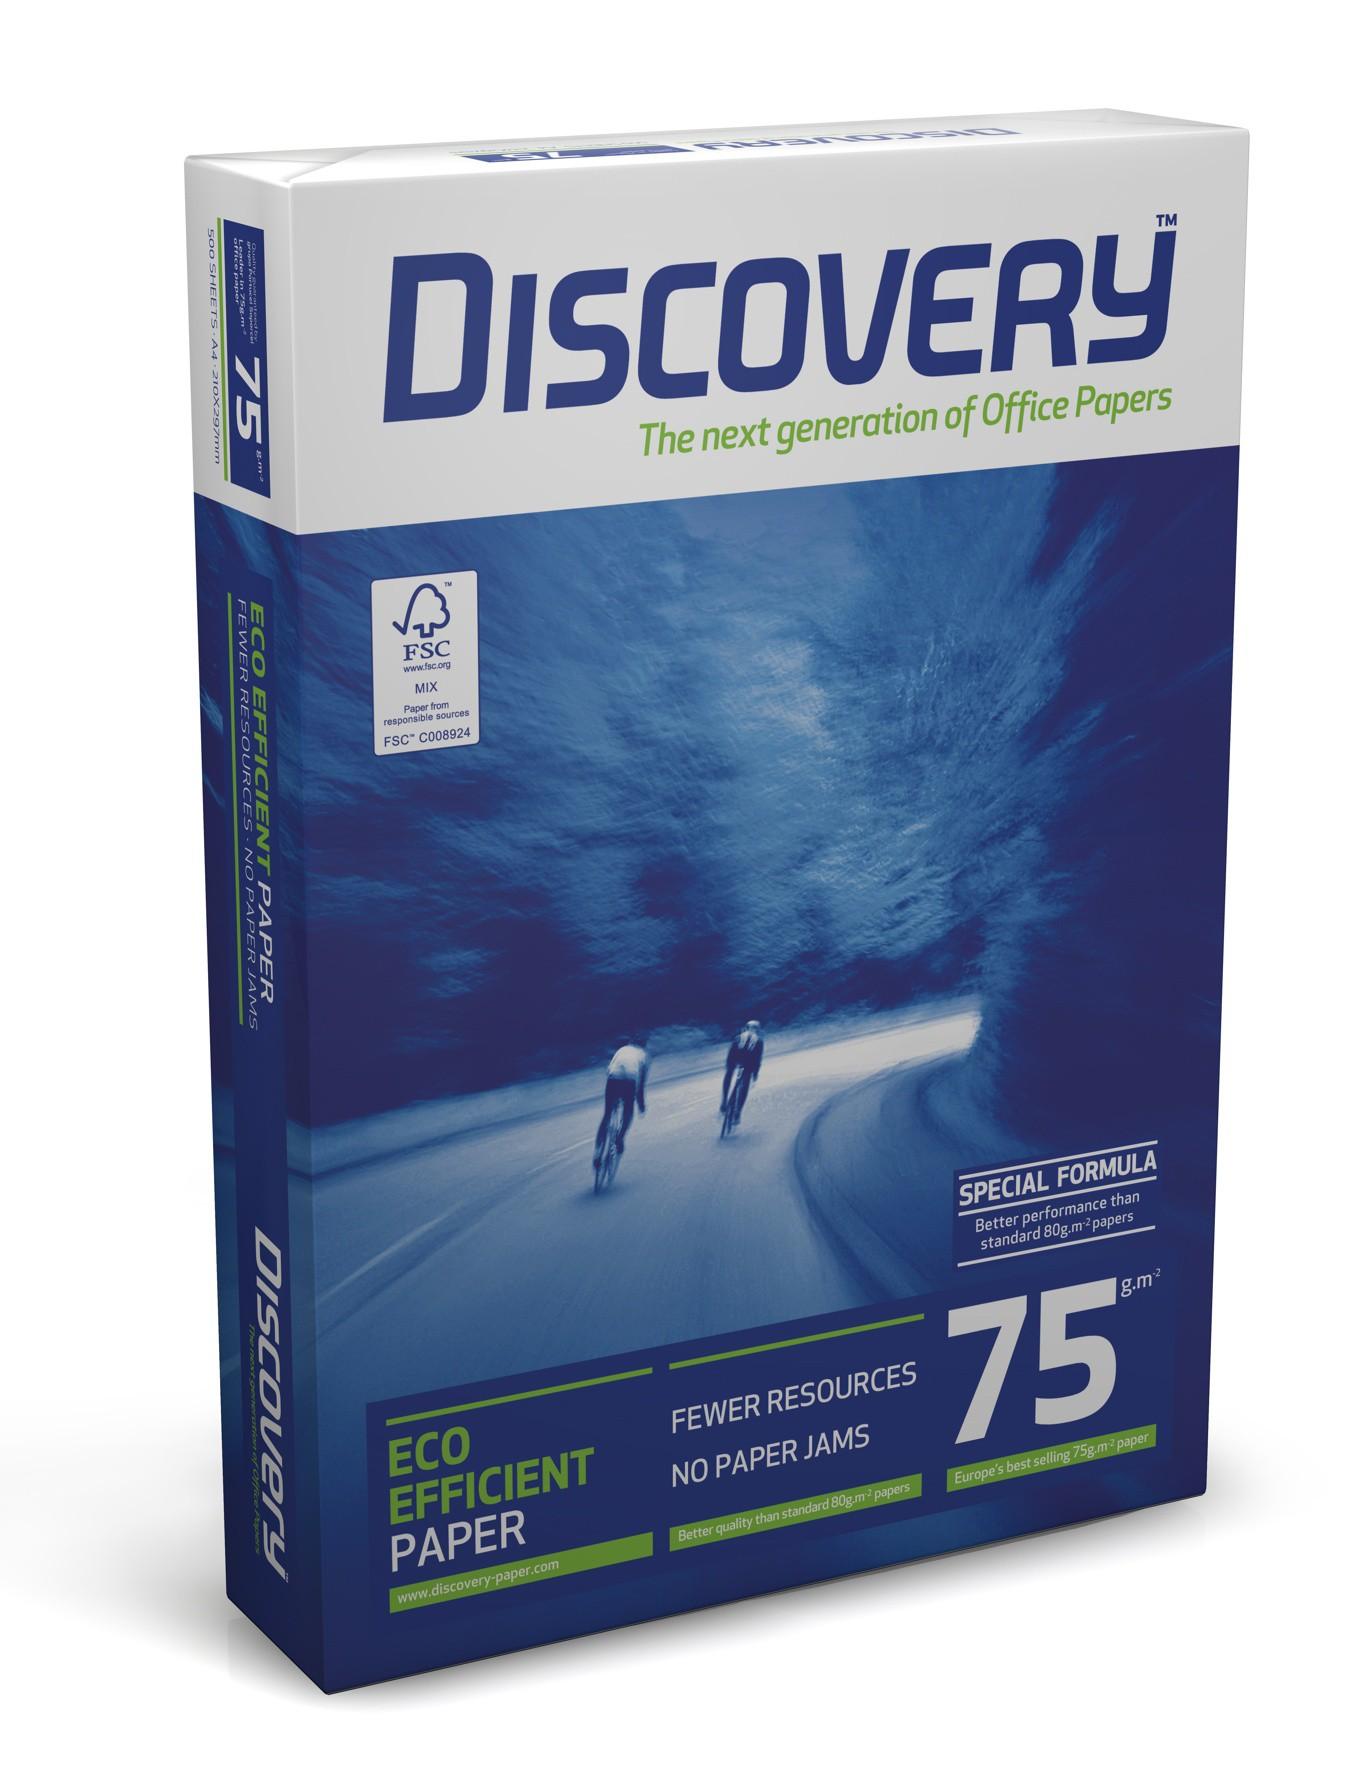 Vorschau: Discovery Multifunktionspapier 75g/m² DIN-A4 - 500 Blatt weiß